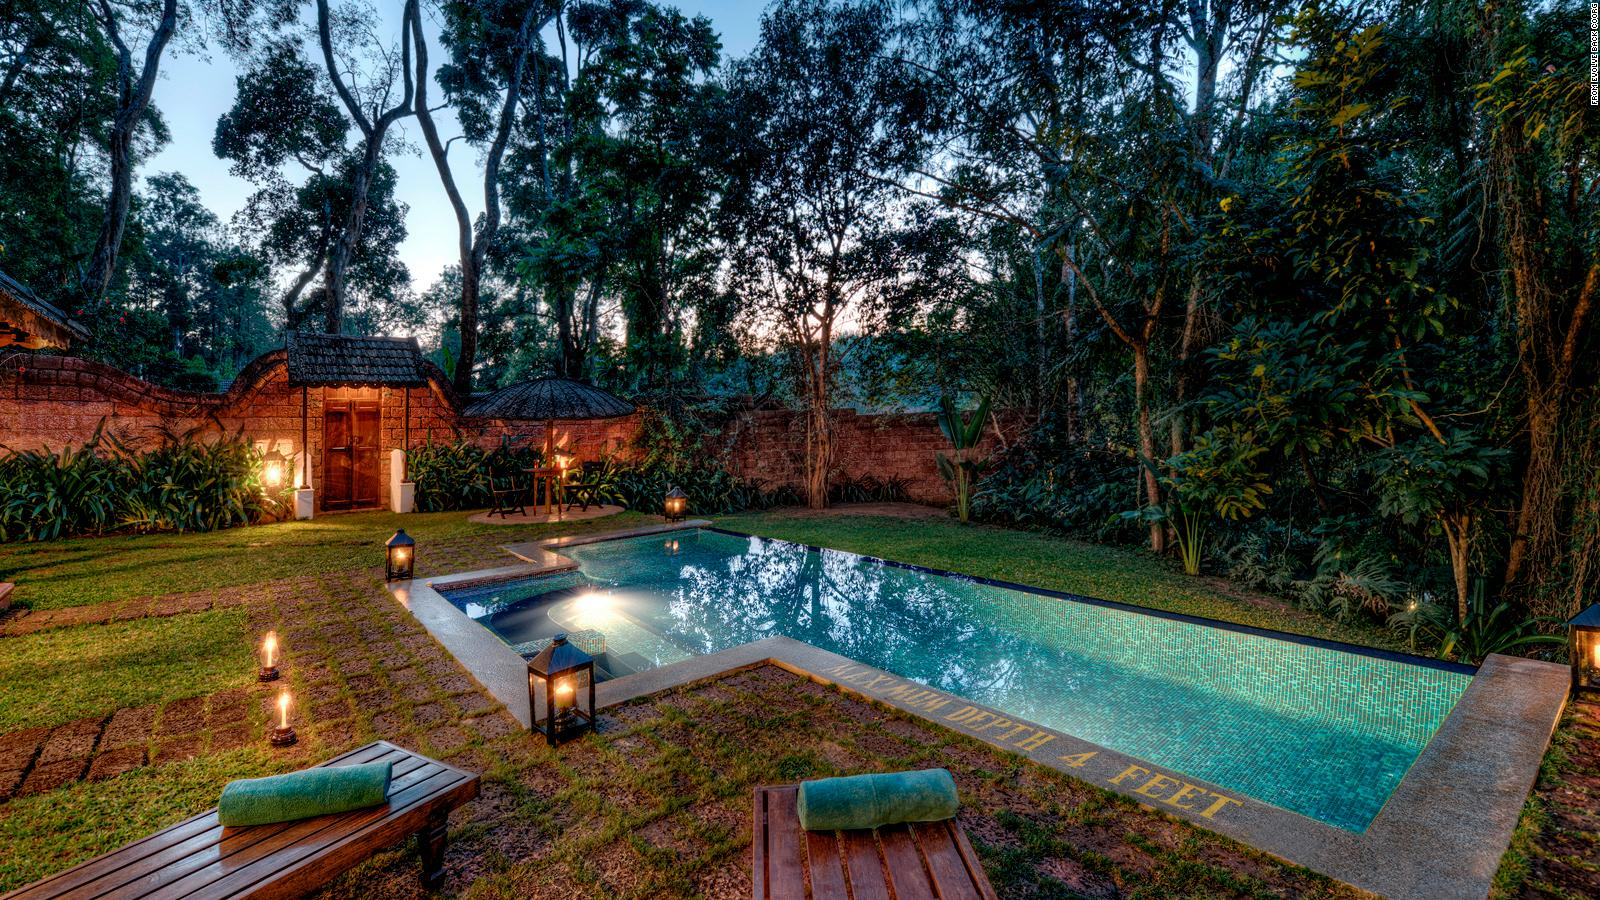 Evolve Back: Inside one of India's greenest luxury resorts